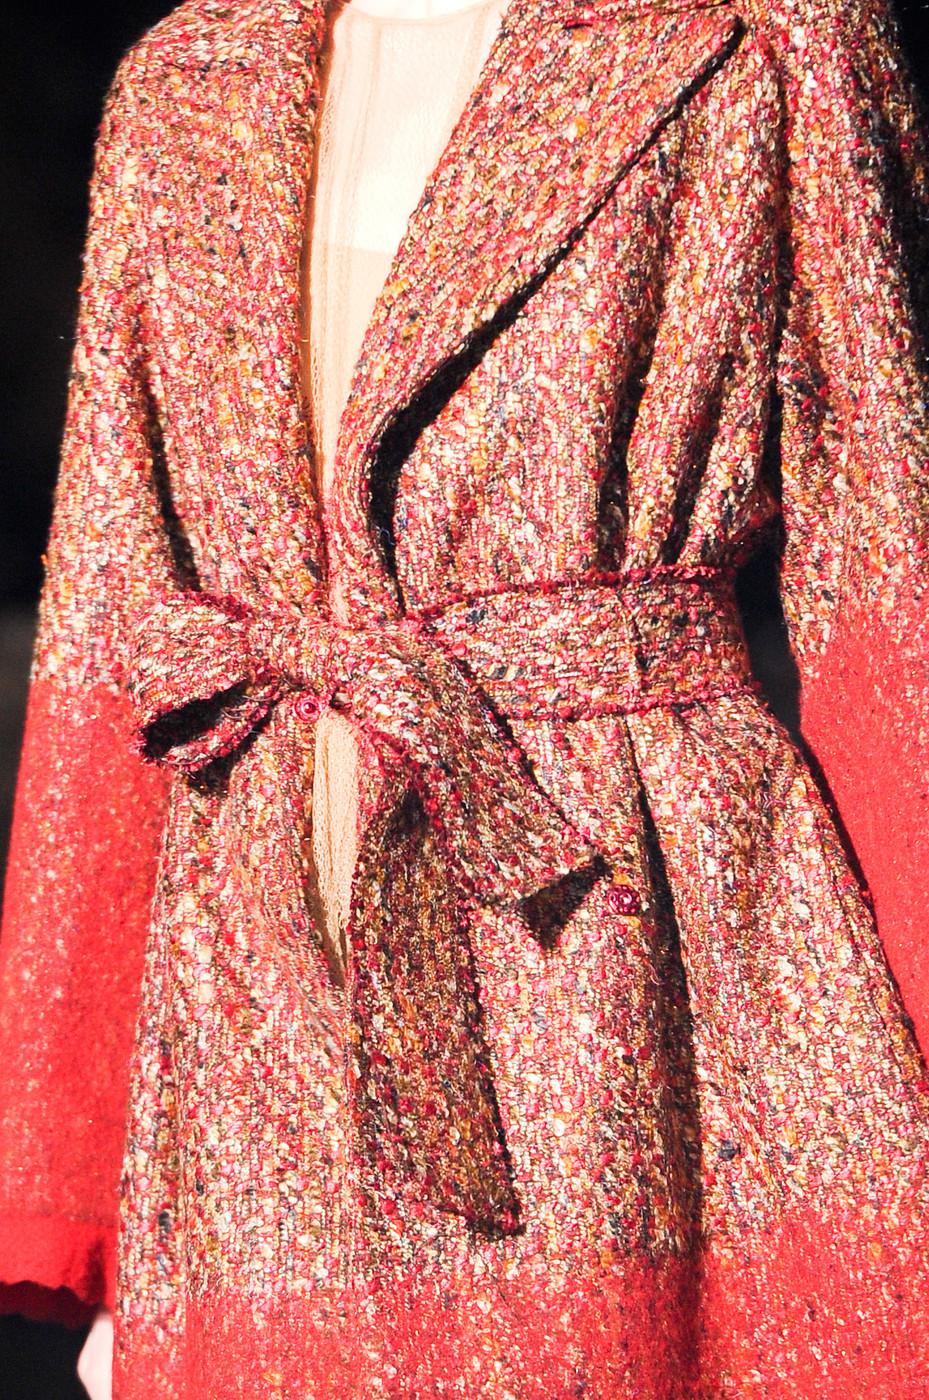 Alberta Ferretti Fall 2014 Milan Fashion Week